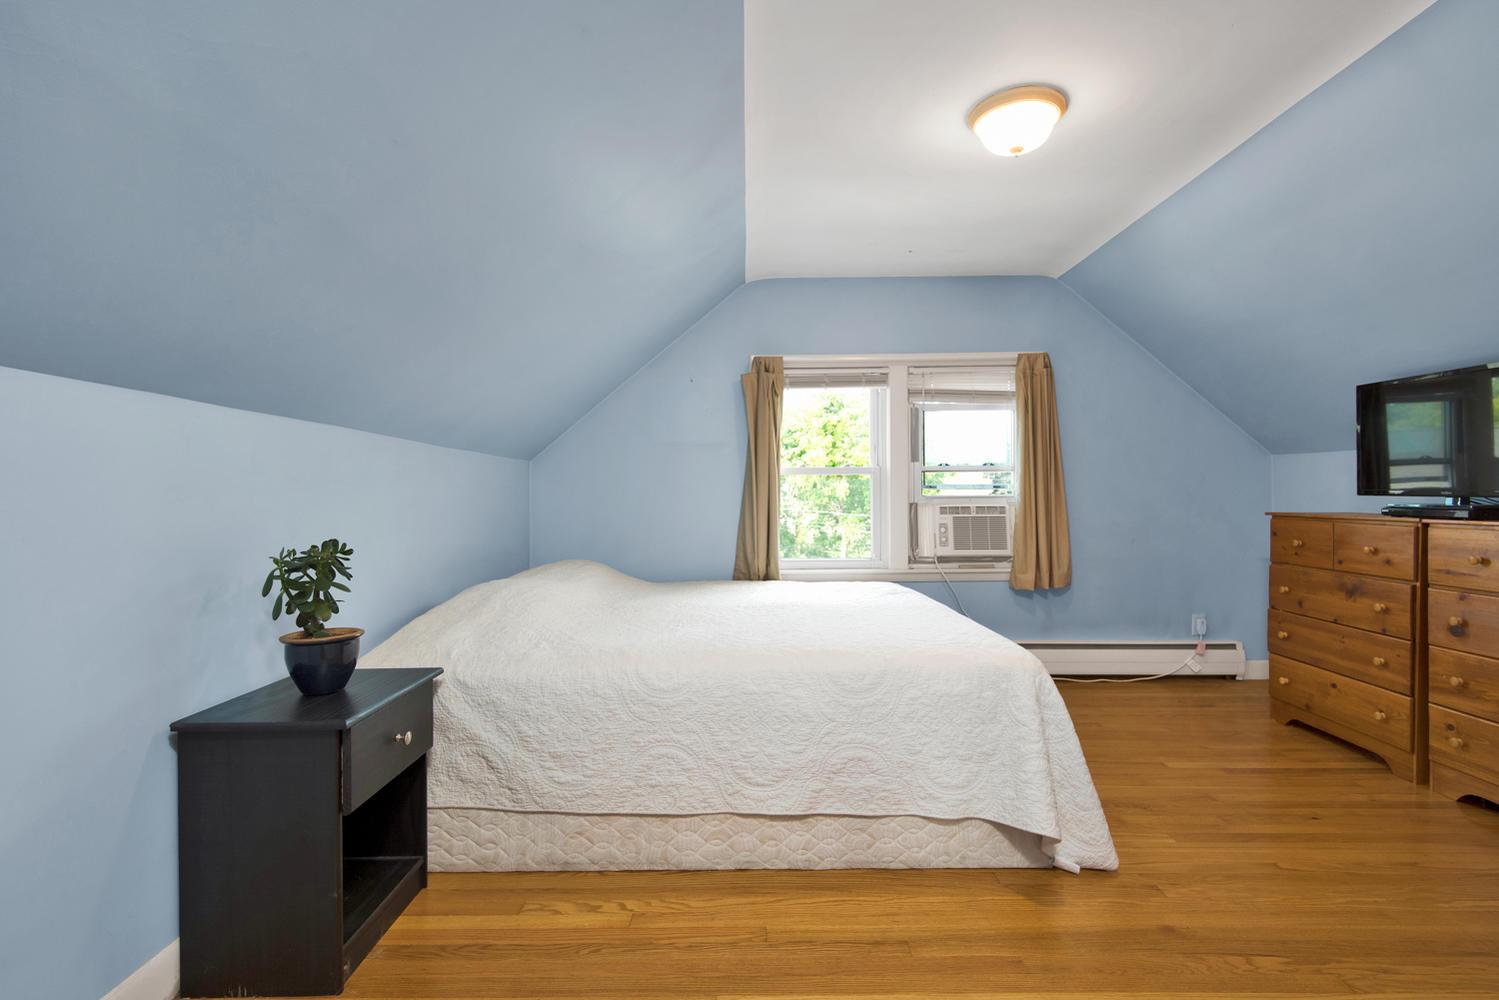 105 Rowe Ave Portland ME 04102-large-017-13-Bedroom 3-1499x1000-72dpi.jpg